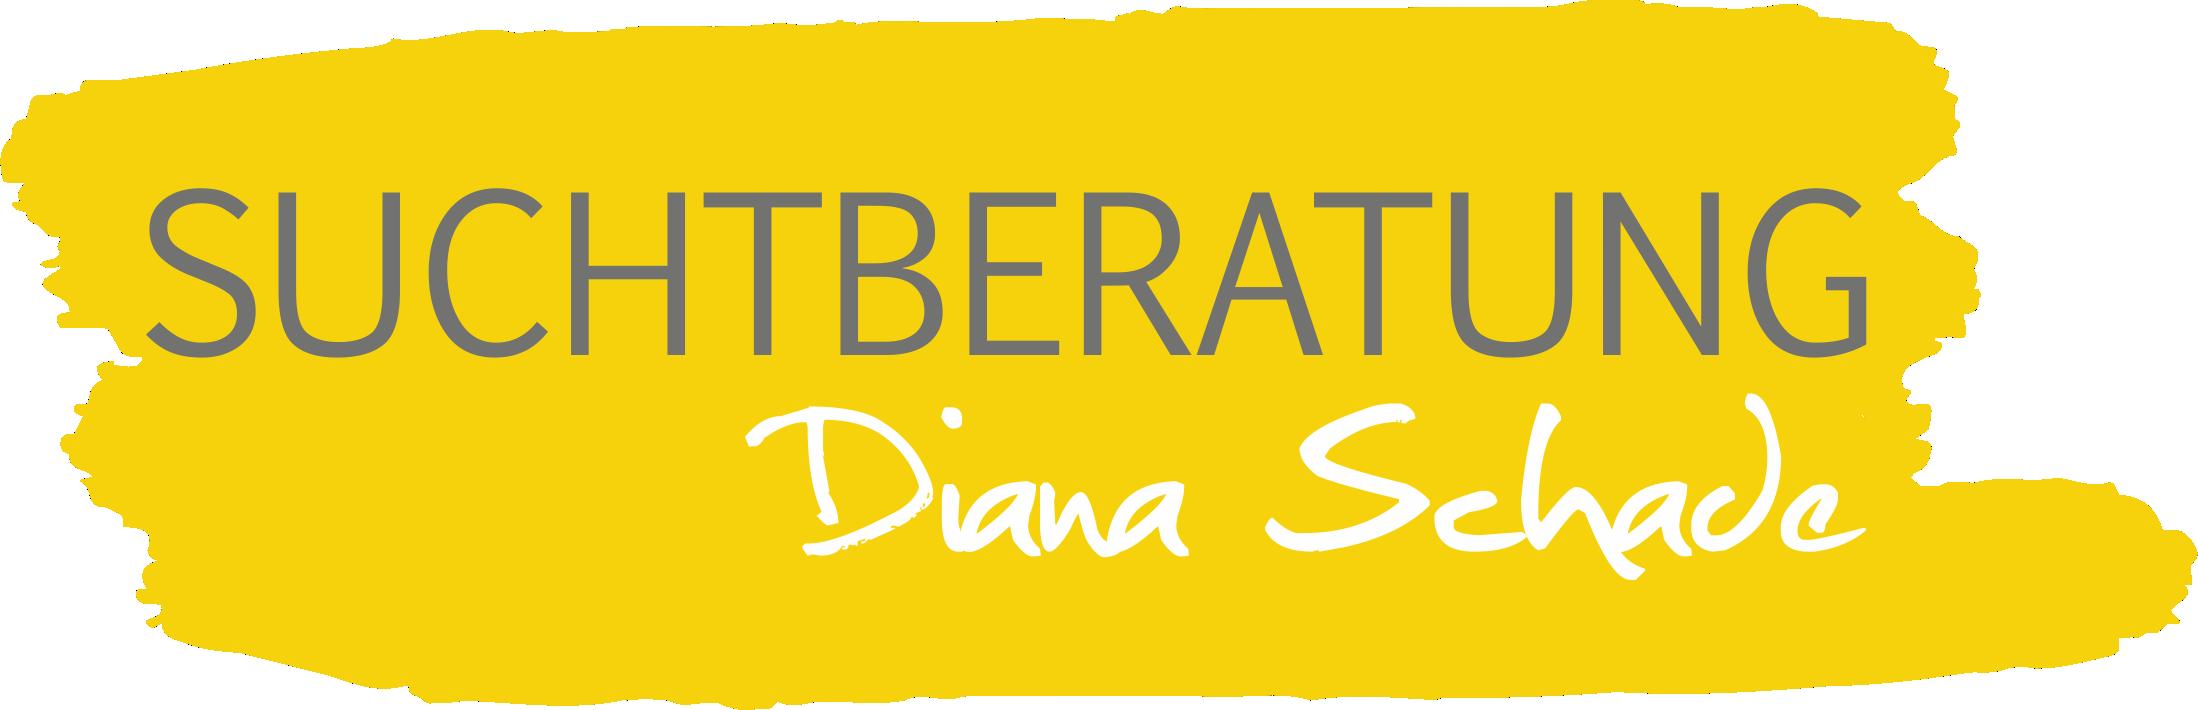 Suchtberatung Diana Schade